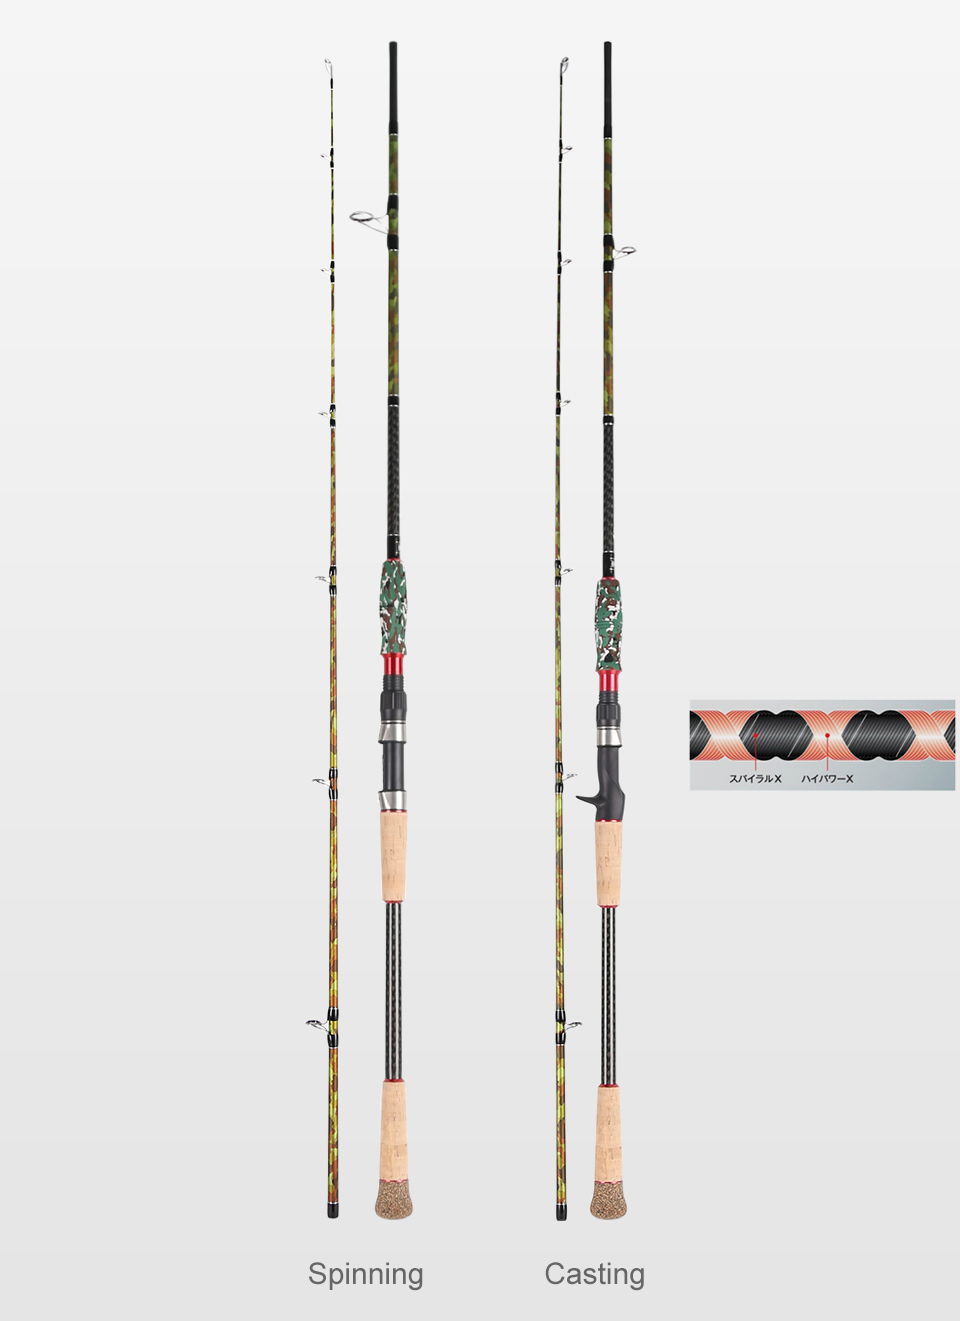 Kingdom Black Cut Spinning Casting Fishing Rod Carton MH, H Power Ultralight Telescopic Fishing Rods 2.39m, 2.49m Travel Rod (5)